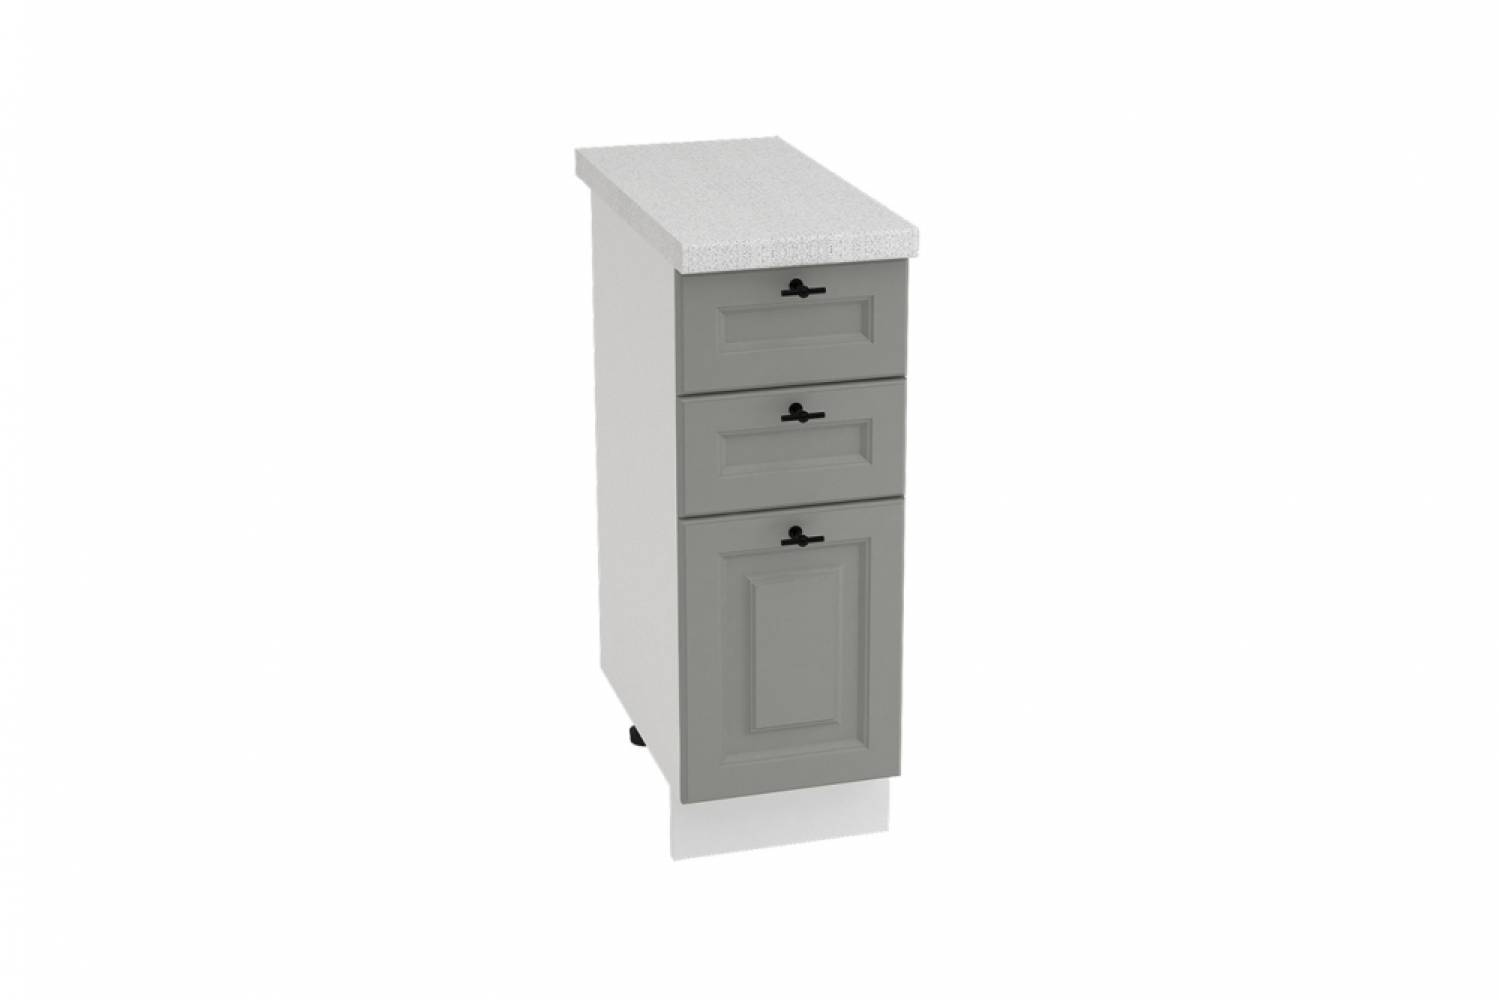 Шкаф нижний с 3 ящиками ШН3Я 300 НИЦЦА ROYAL (MAGNUM) 300 мм